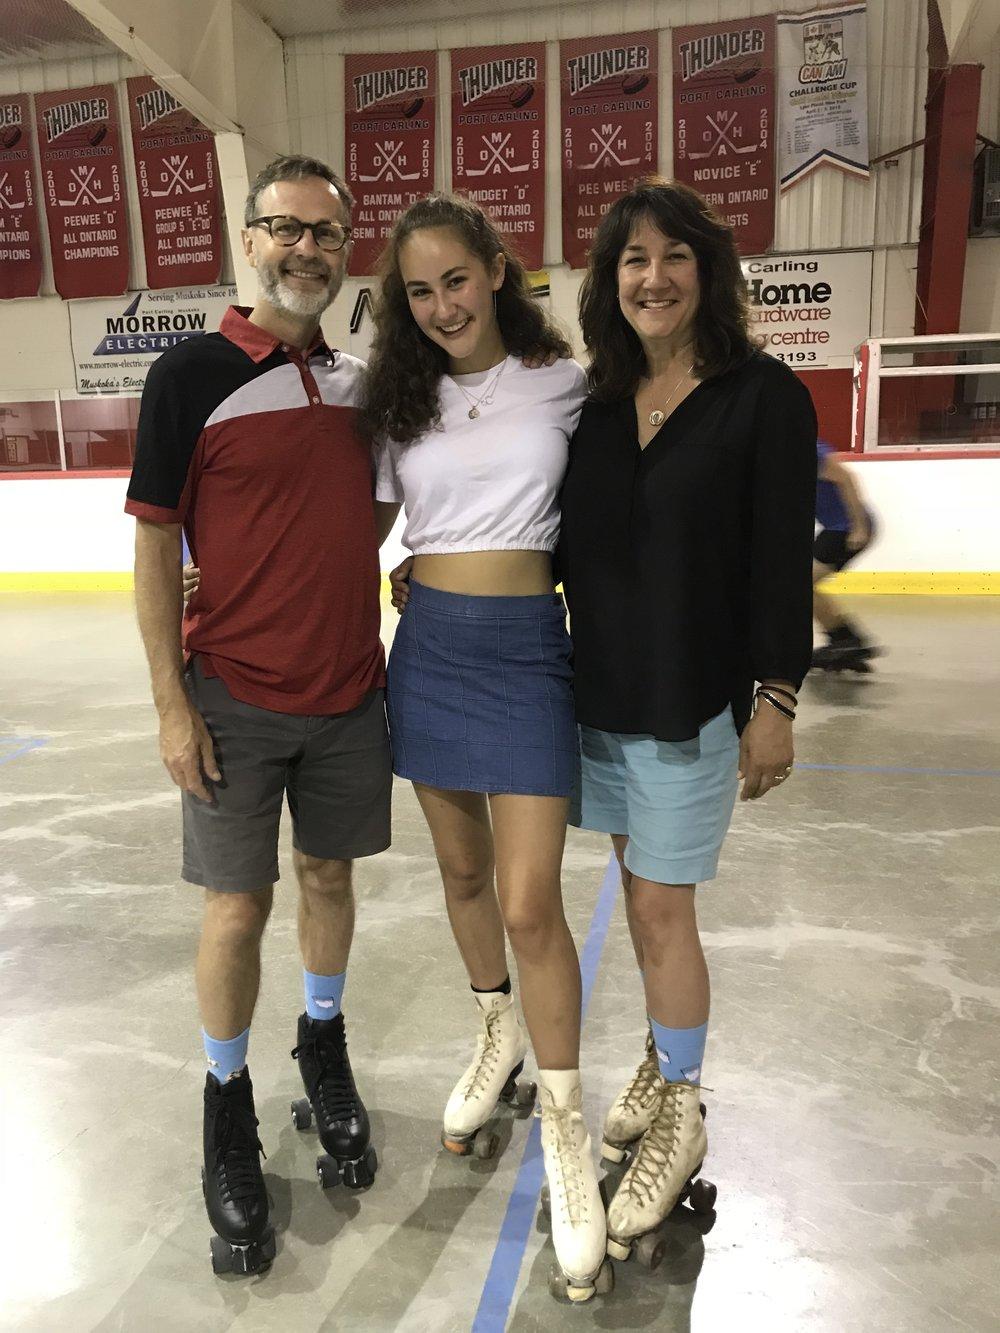 The Annual Family Rollerskating Bonanza.